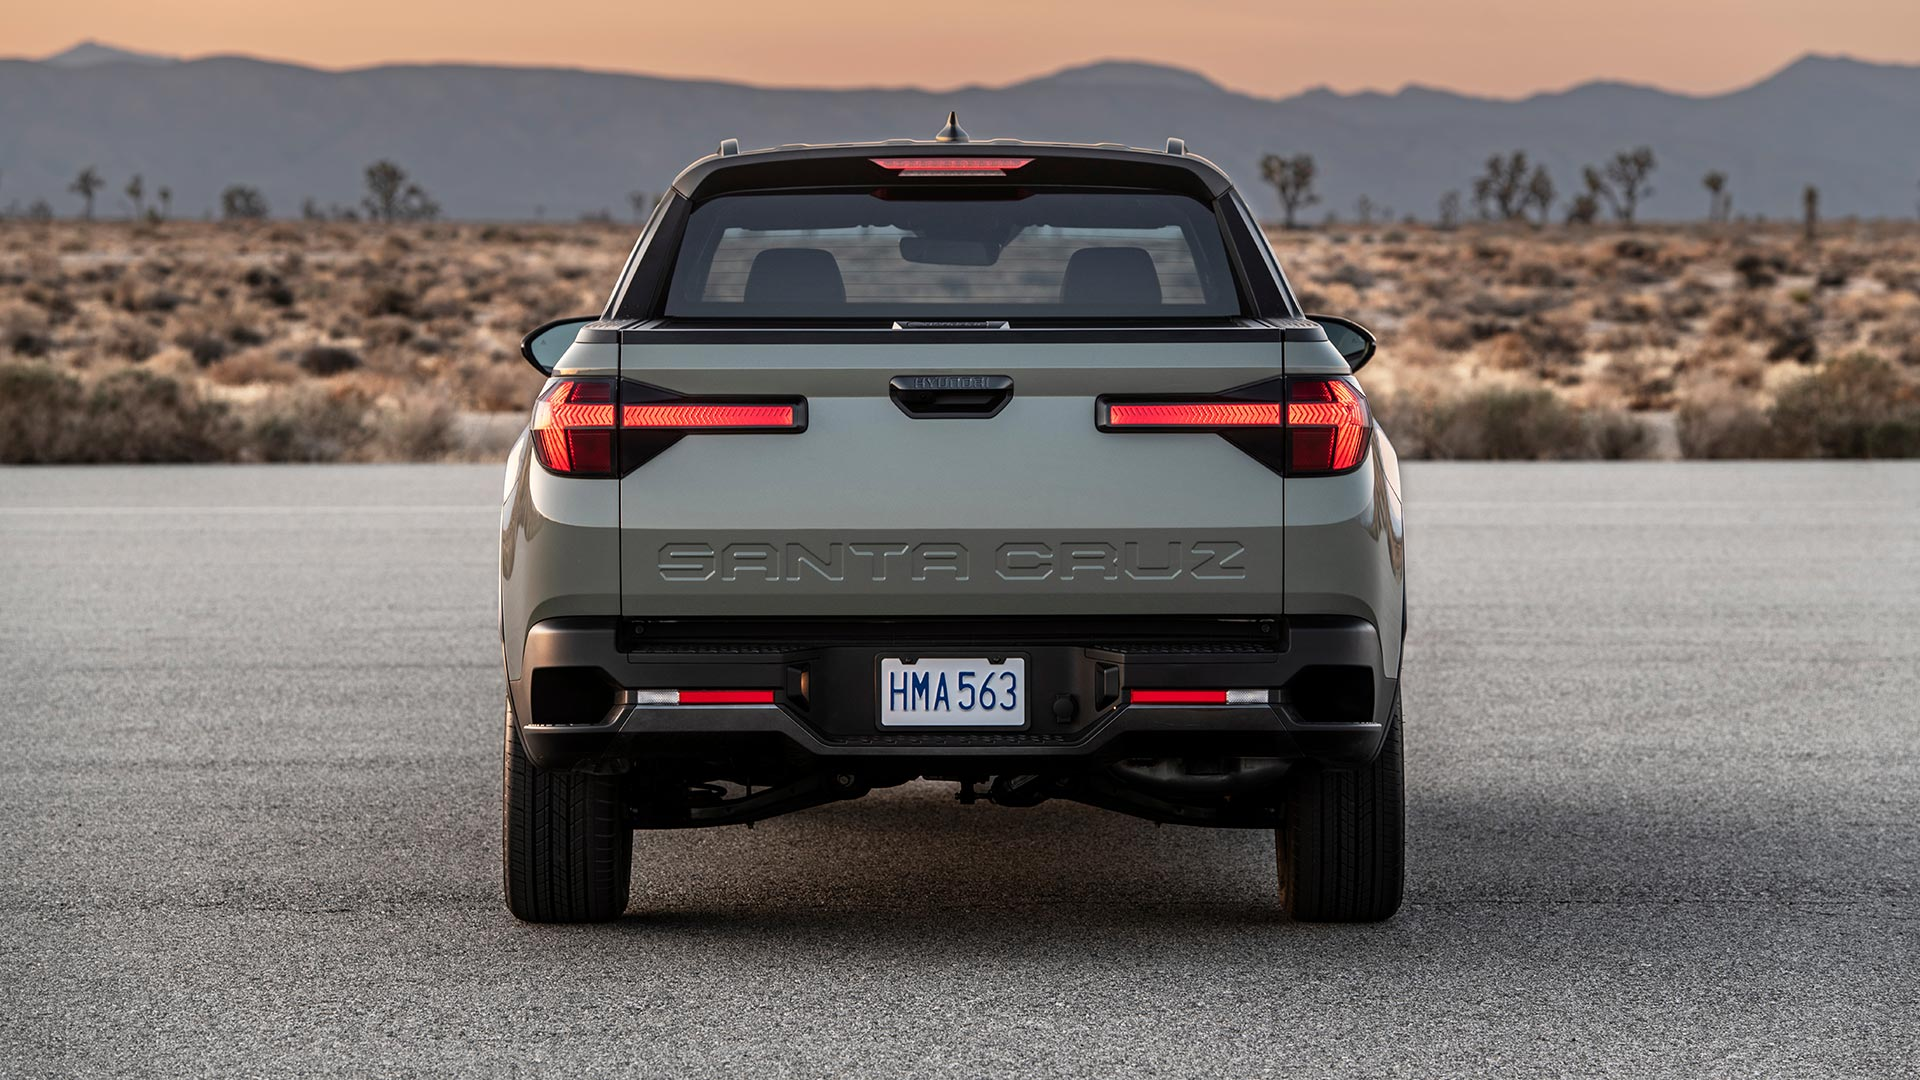 Hyundai Santa Cruz Rear View